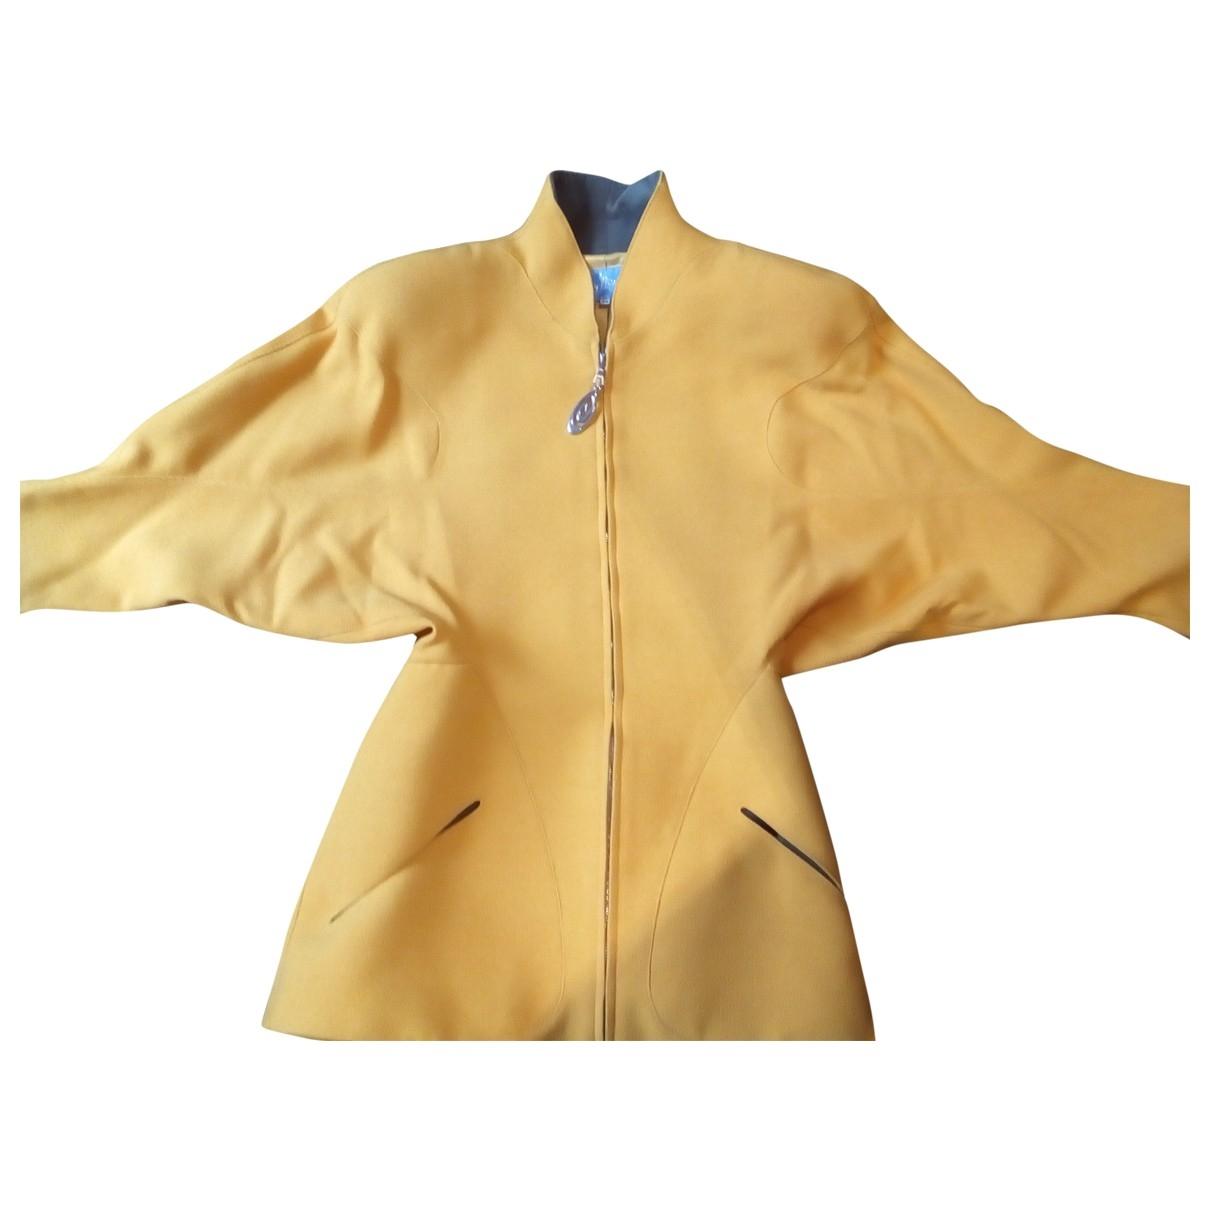 Thierry Mugler \N Yellow Wool jacket for Women 36 FR